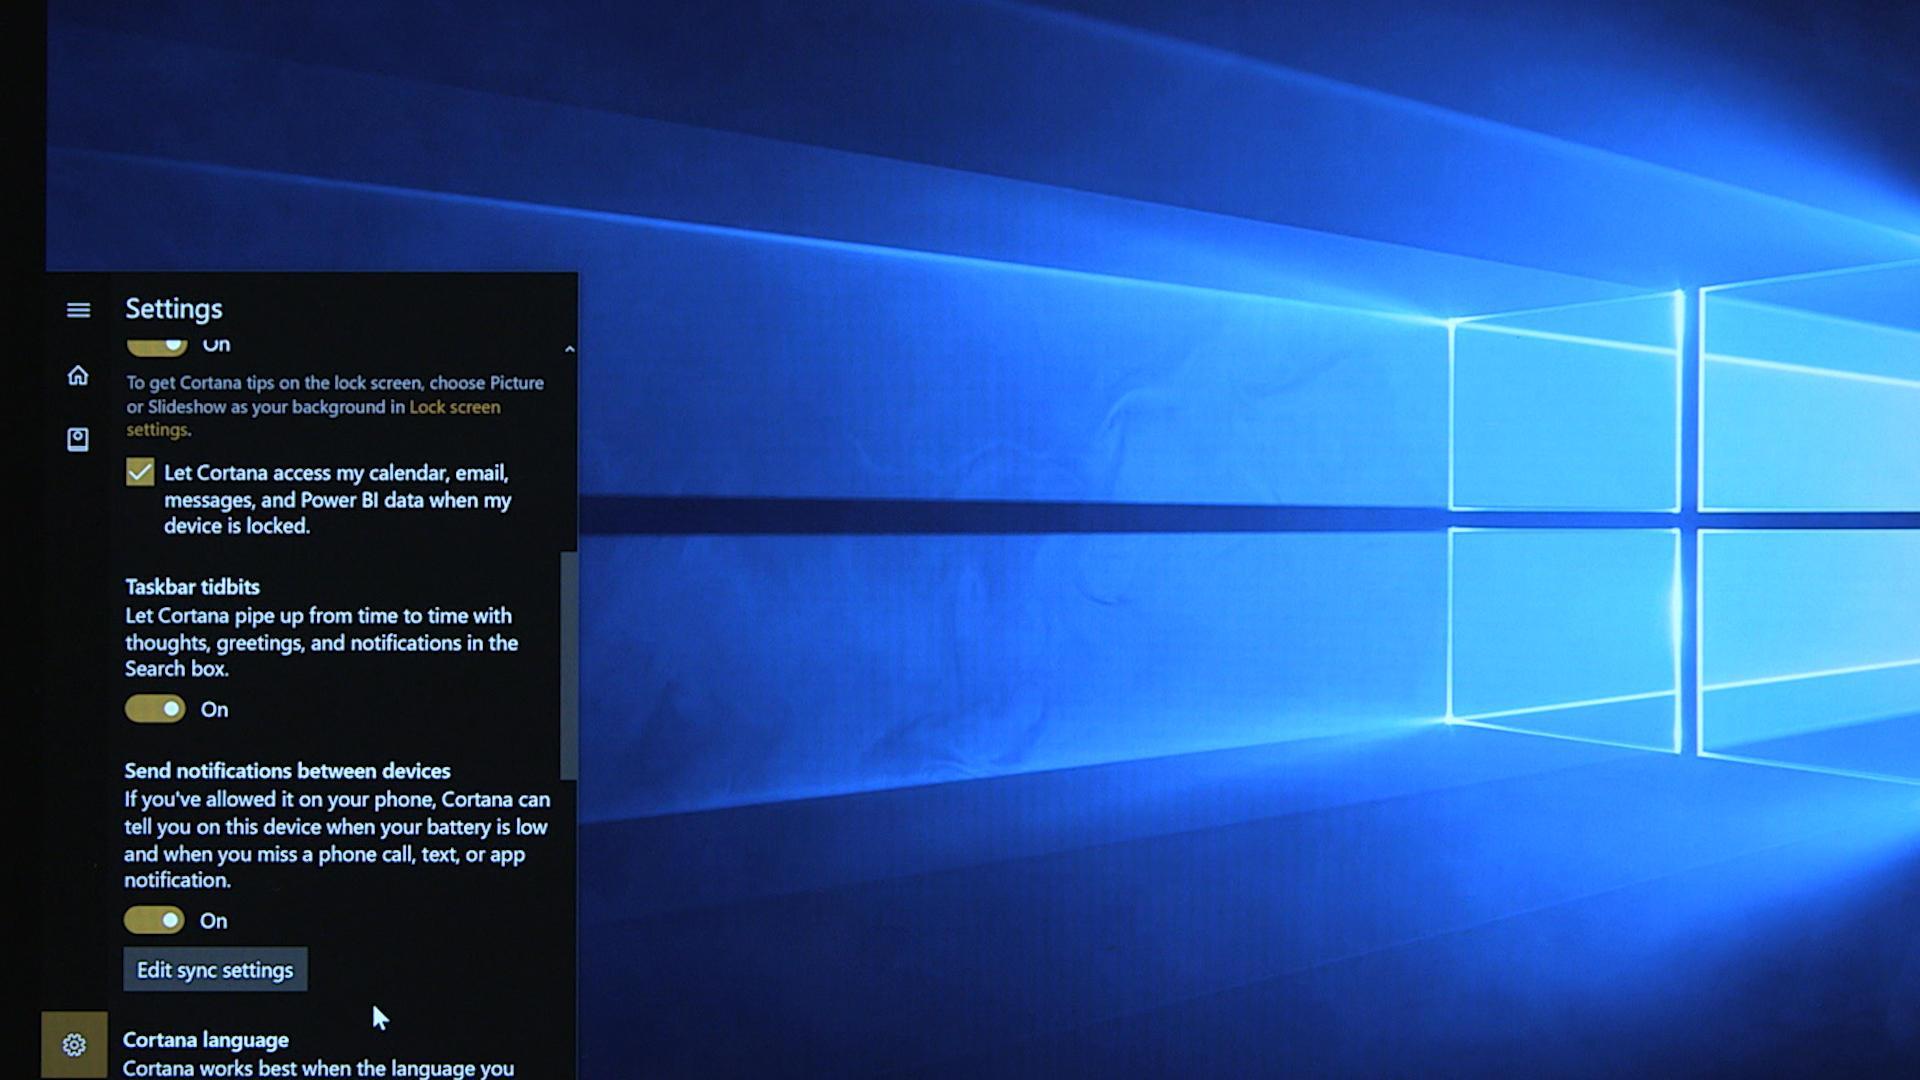 Cortana gets some new tricks in Windows 10